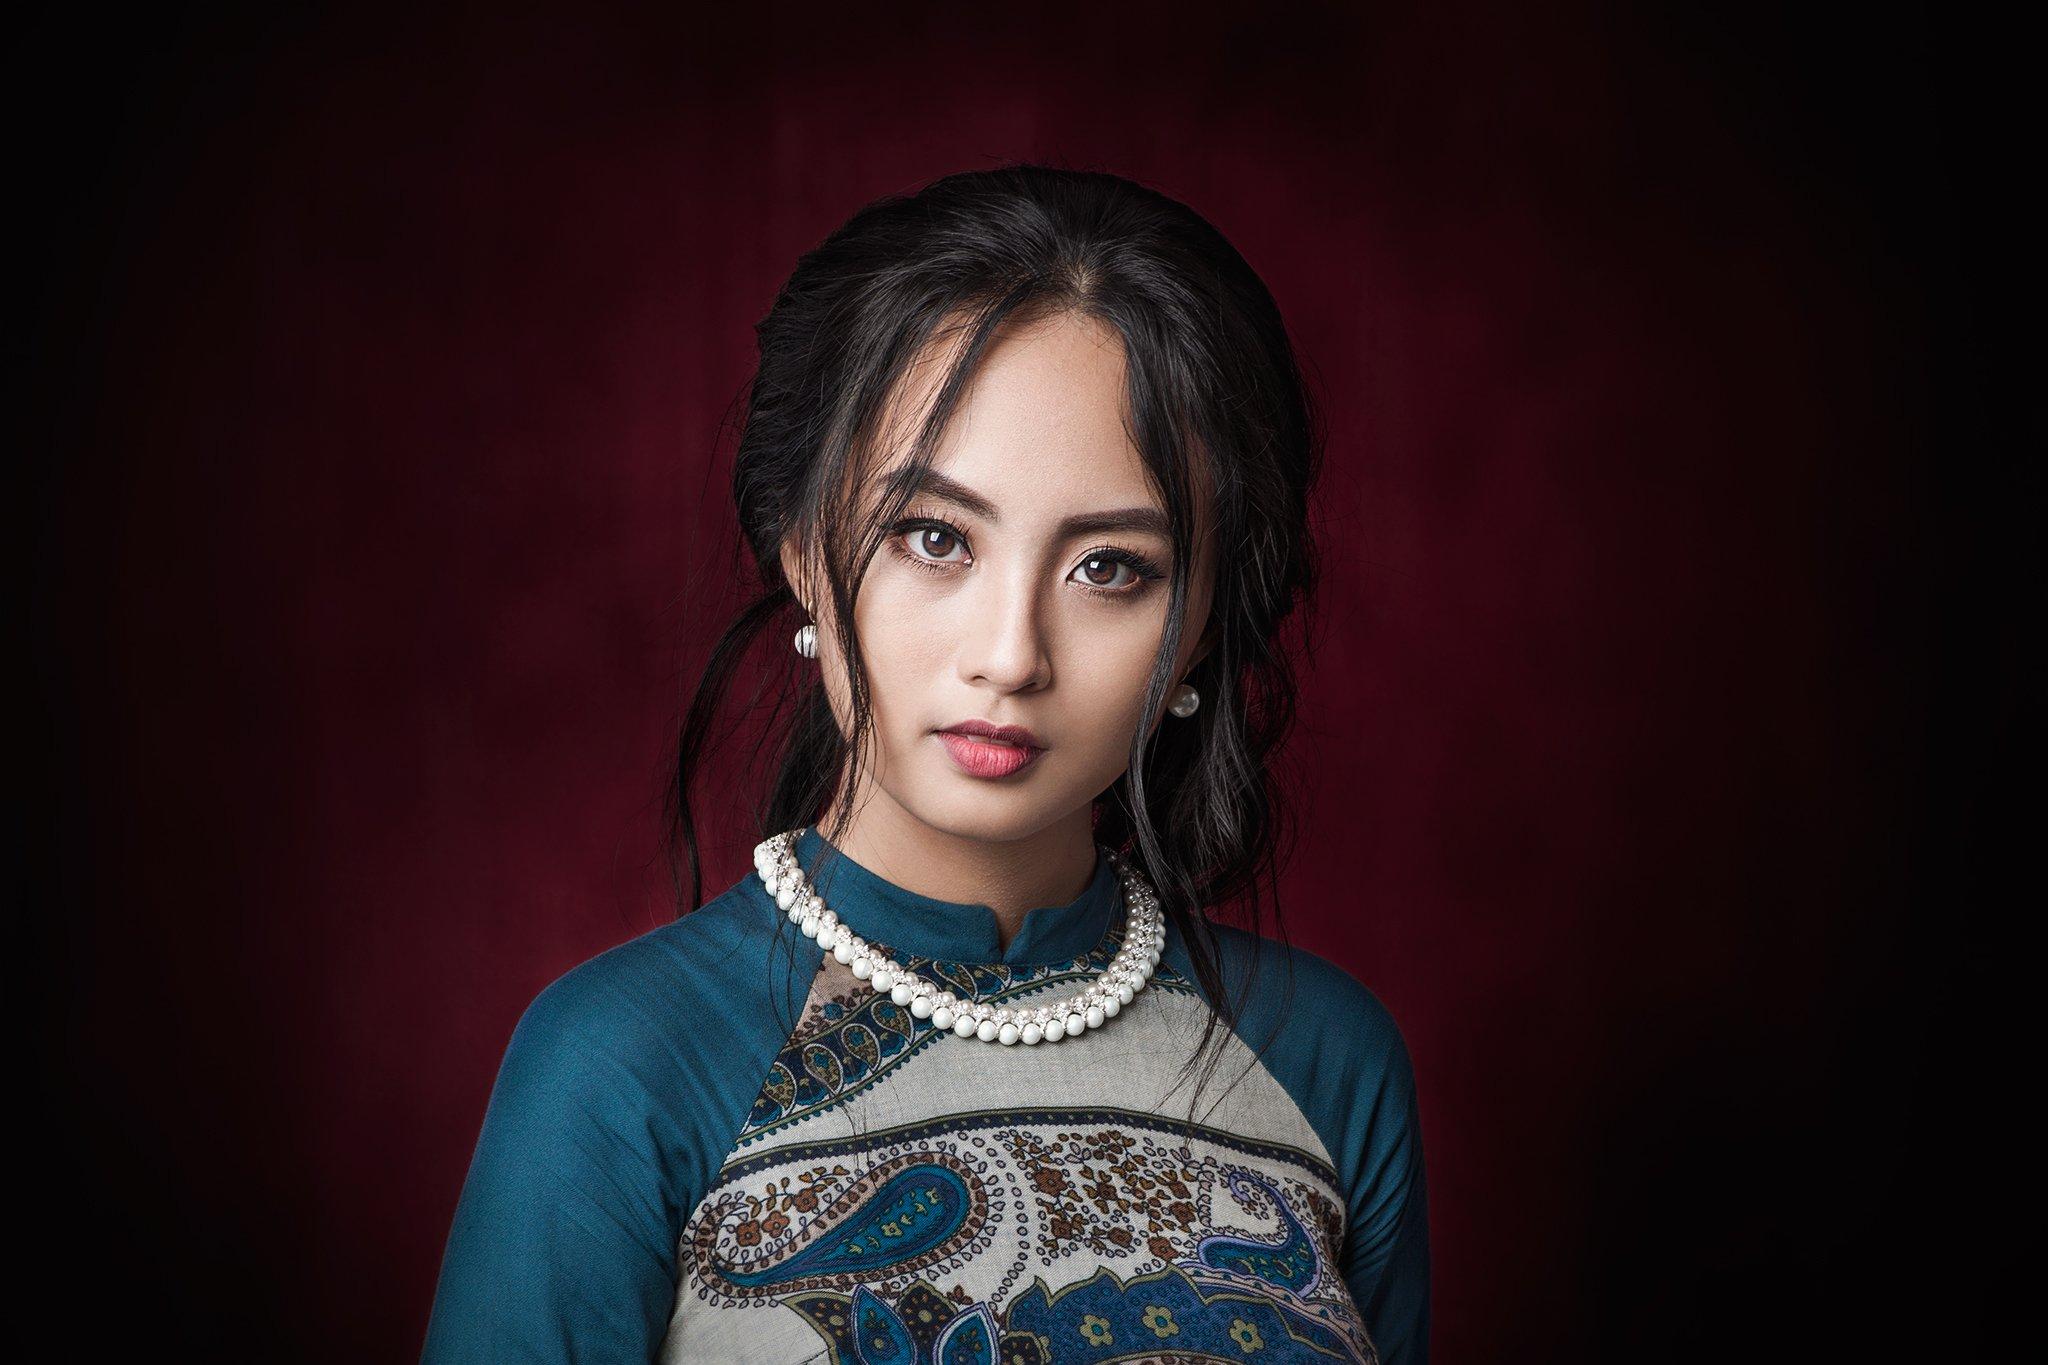 portrait, face, girl, asian, vietnam, vietnamese, eyes, longhair, young, glamour, beauty, model, dress, Hoang Viet Nguyen